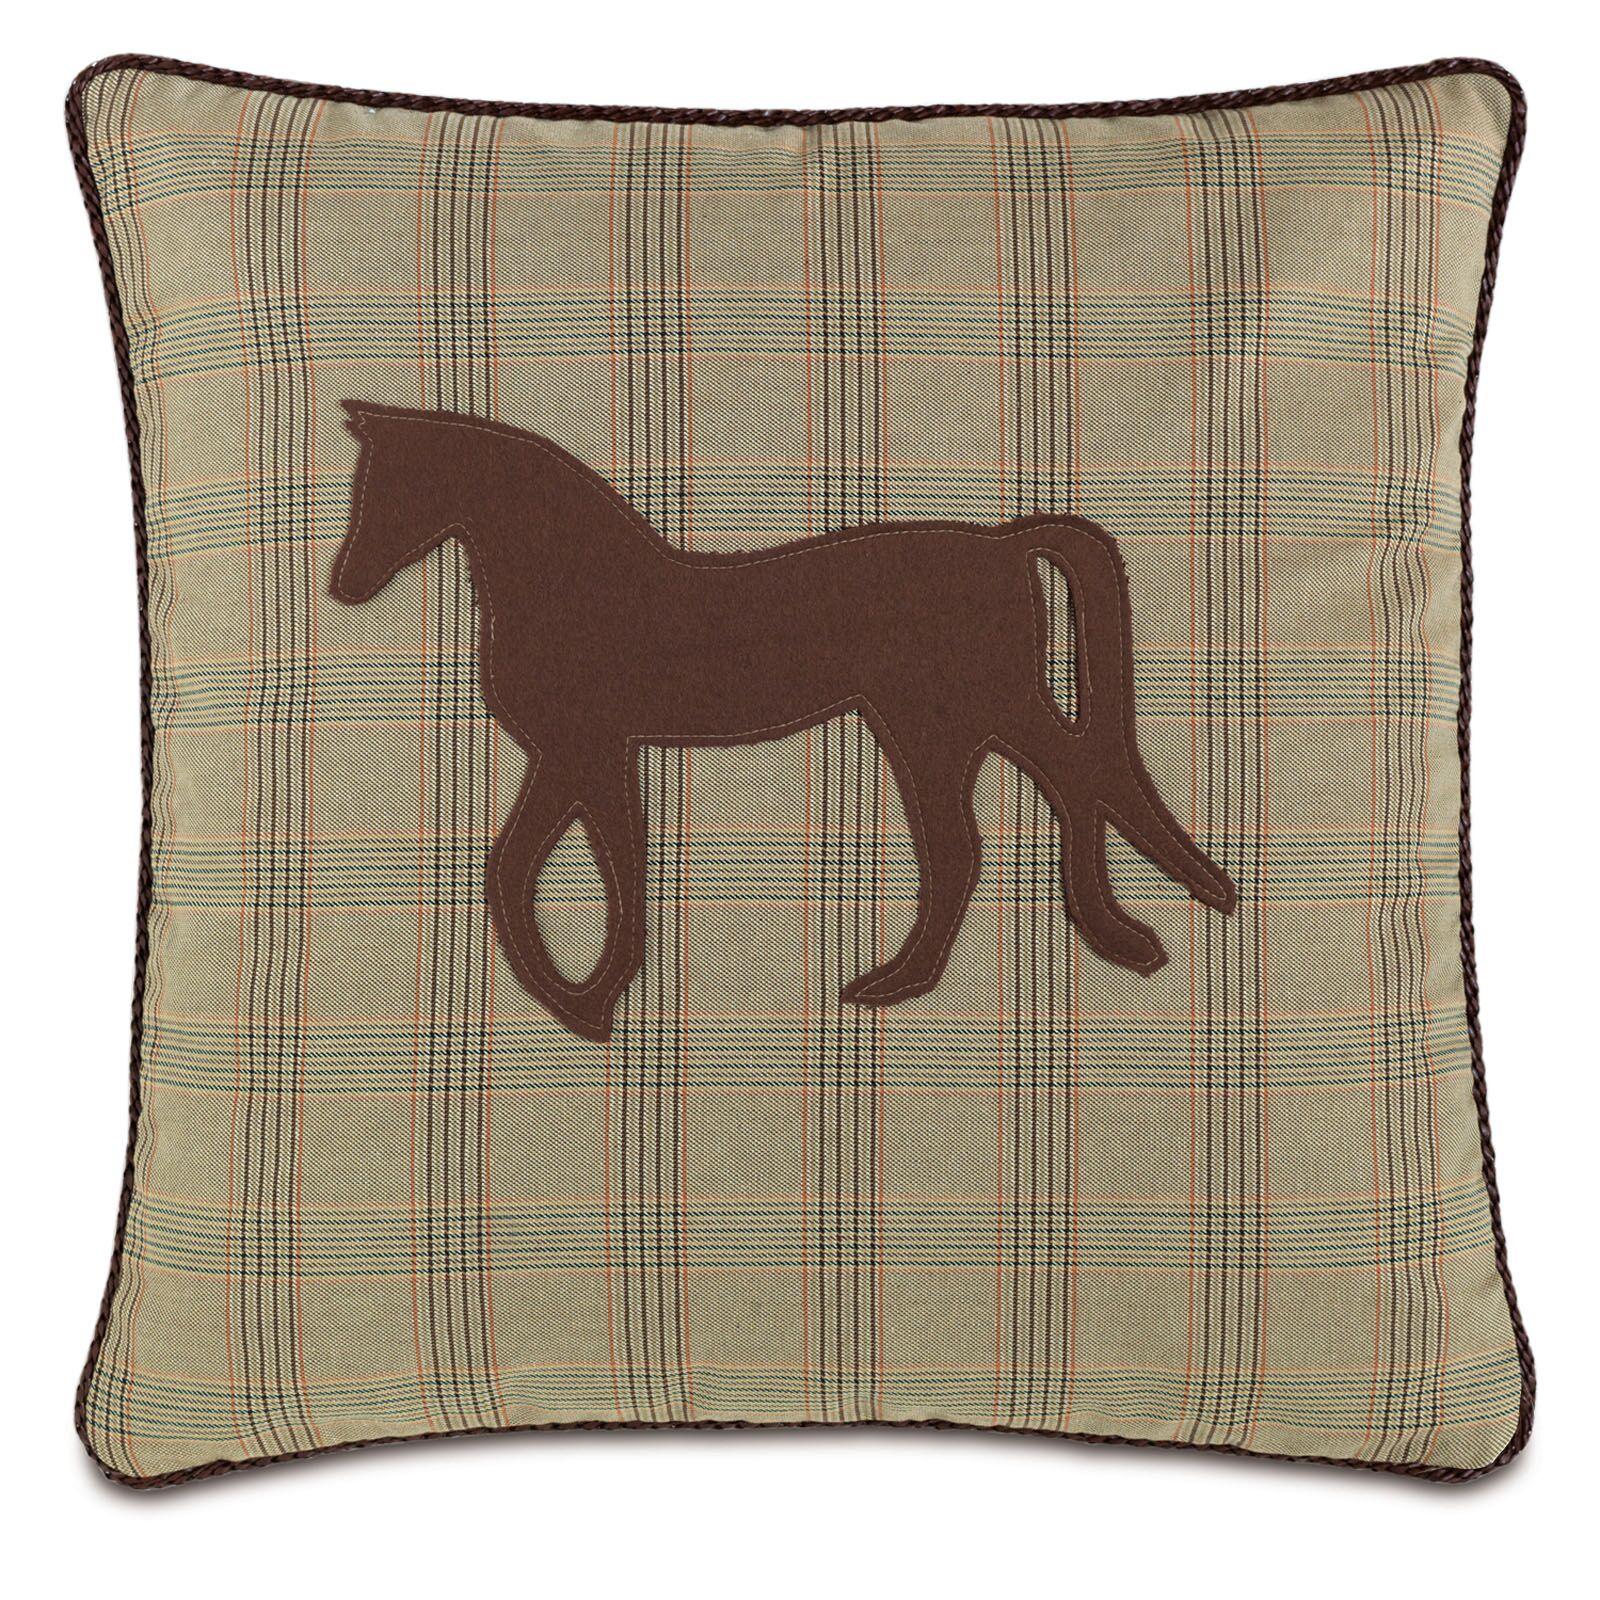 Equestrian Mustang Throw Pillow